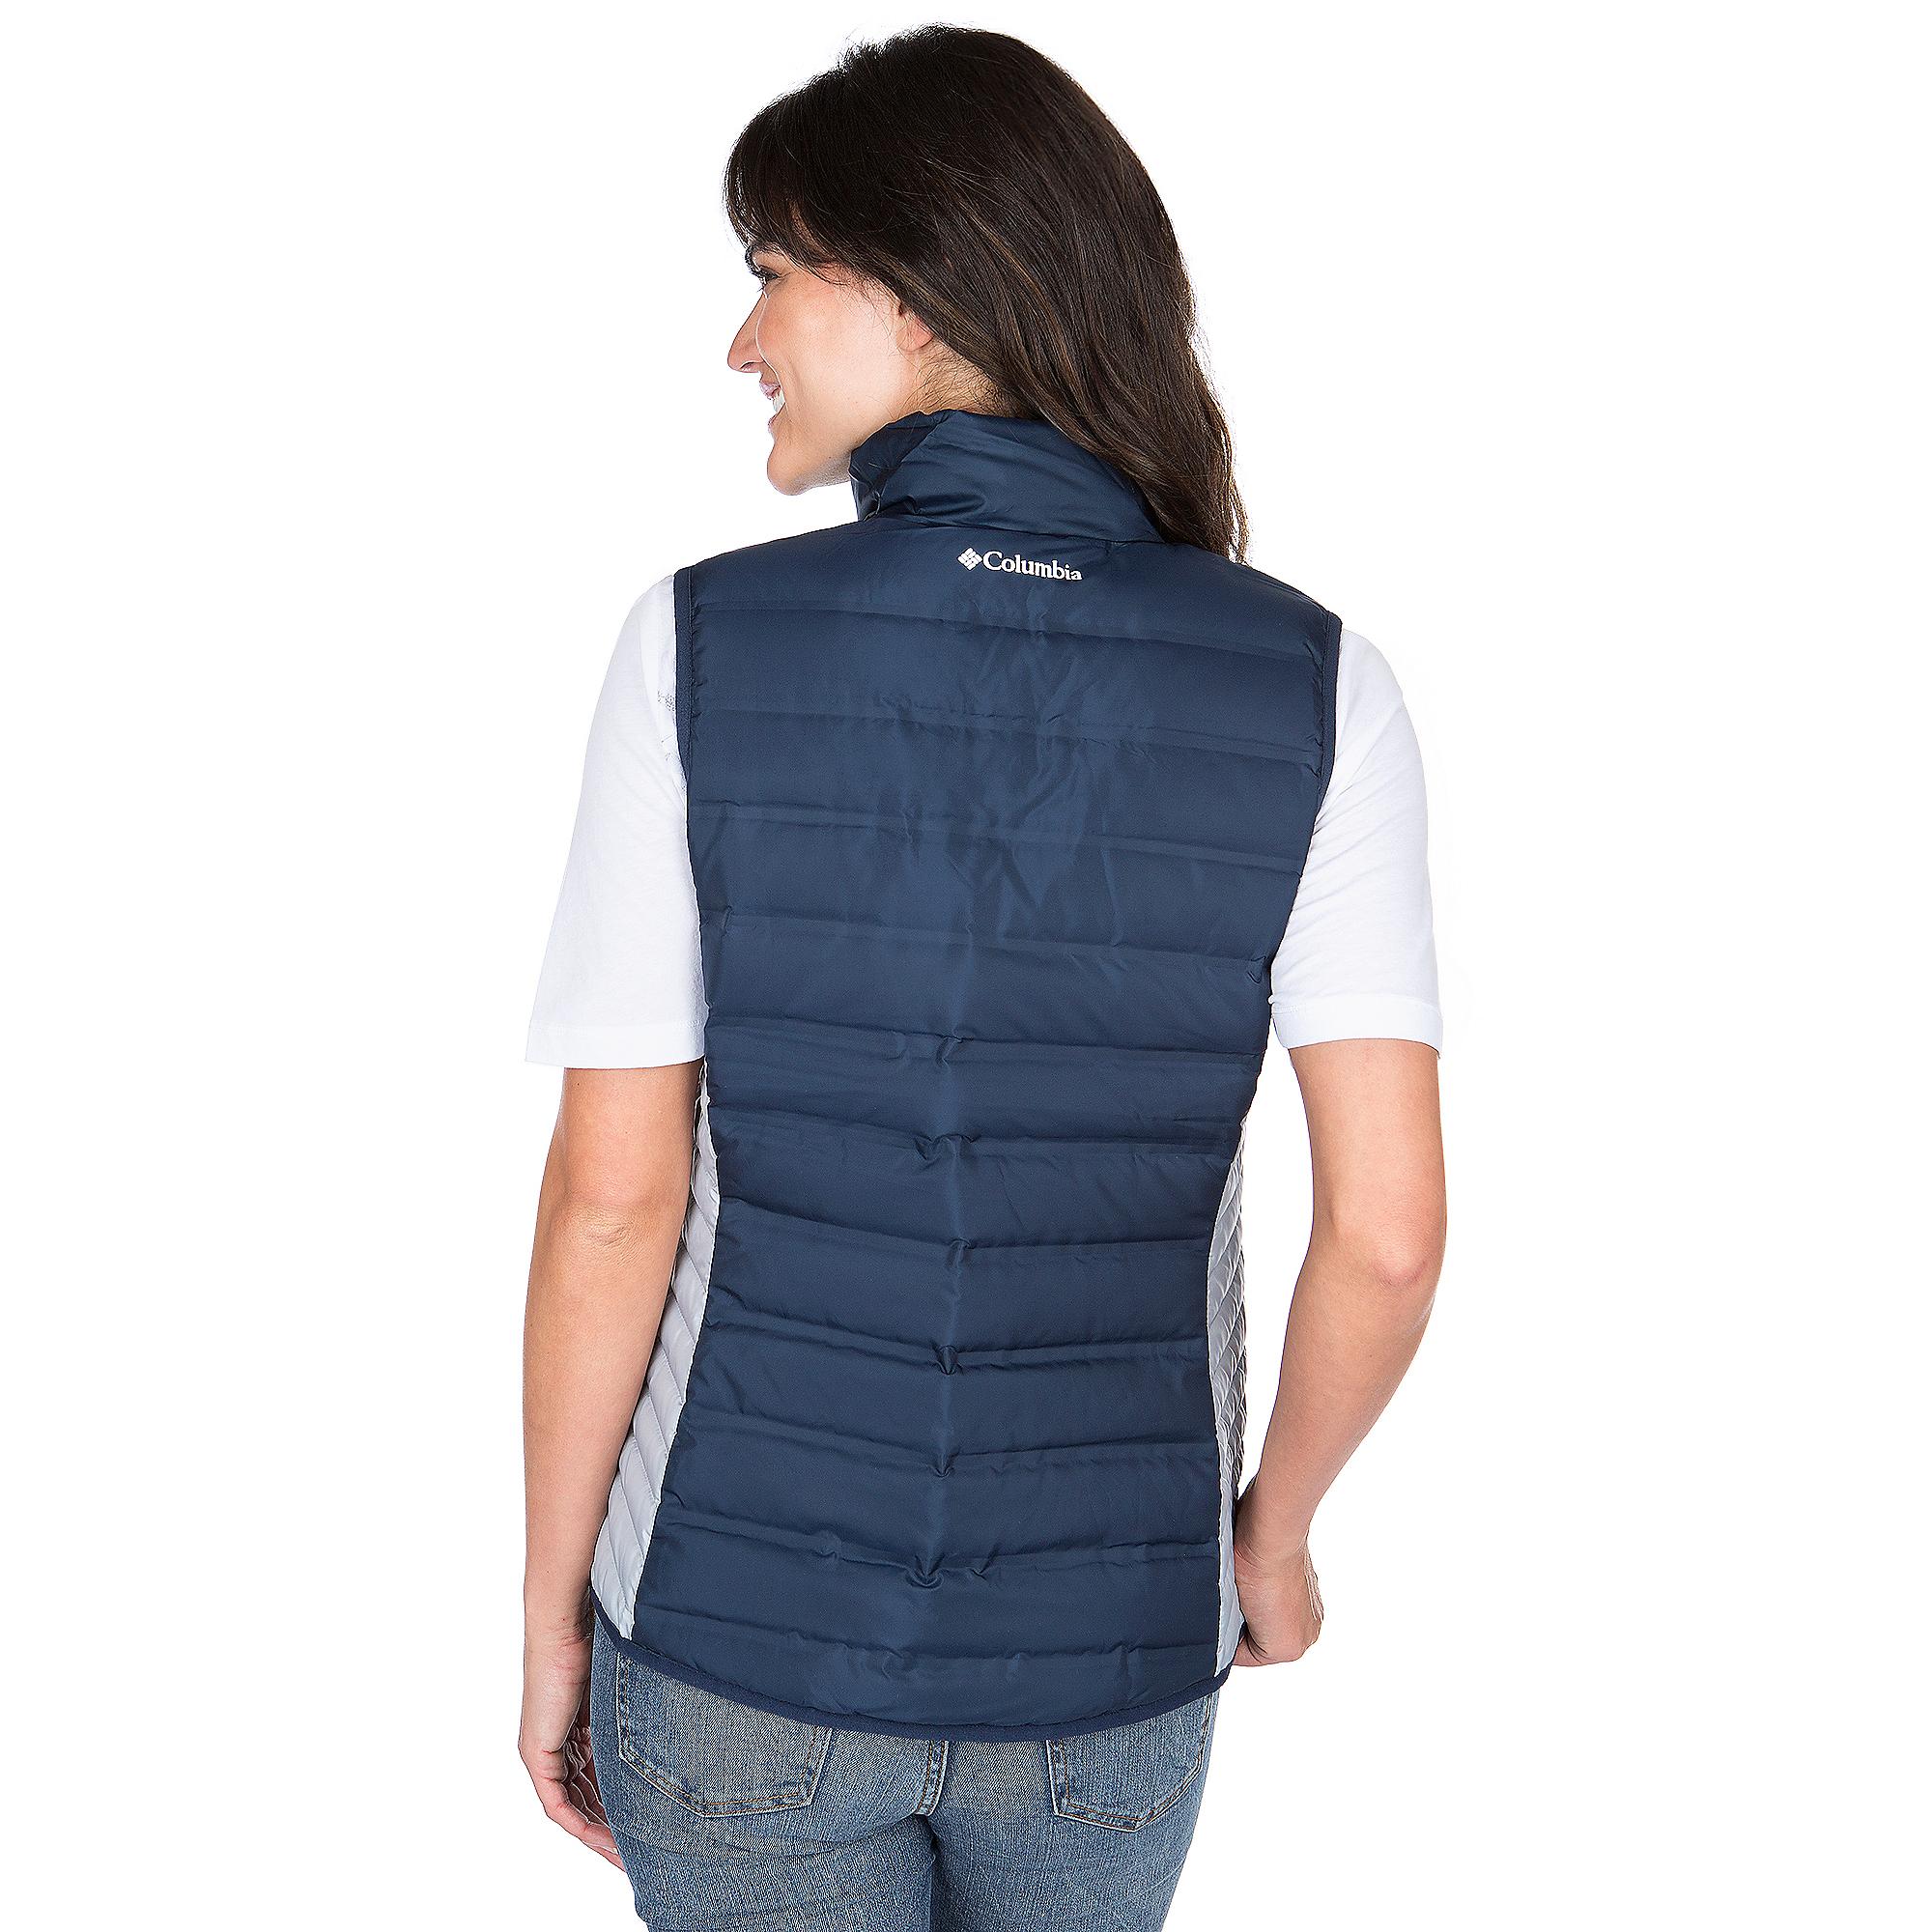 cheap for discount 6f099 c7243 Dallas Cowboys Columbia Womens Lake 22 Down Vest | Dallas Cowboys Pro Shop